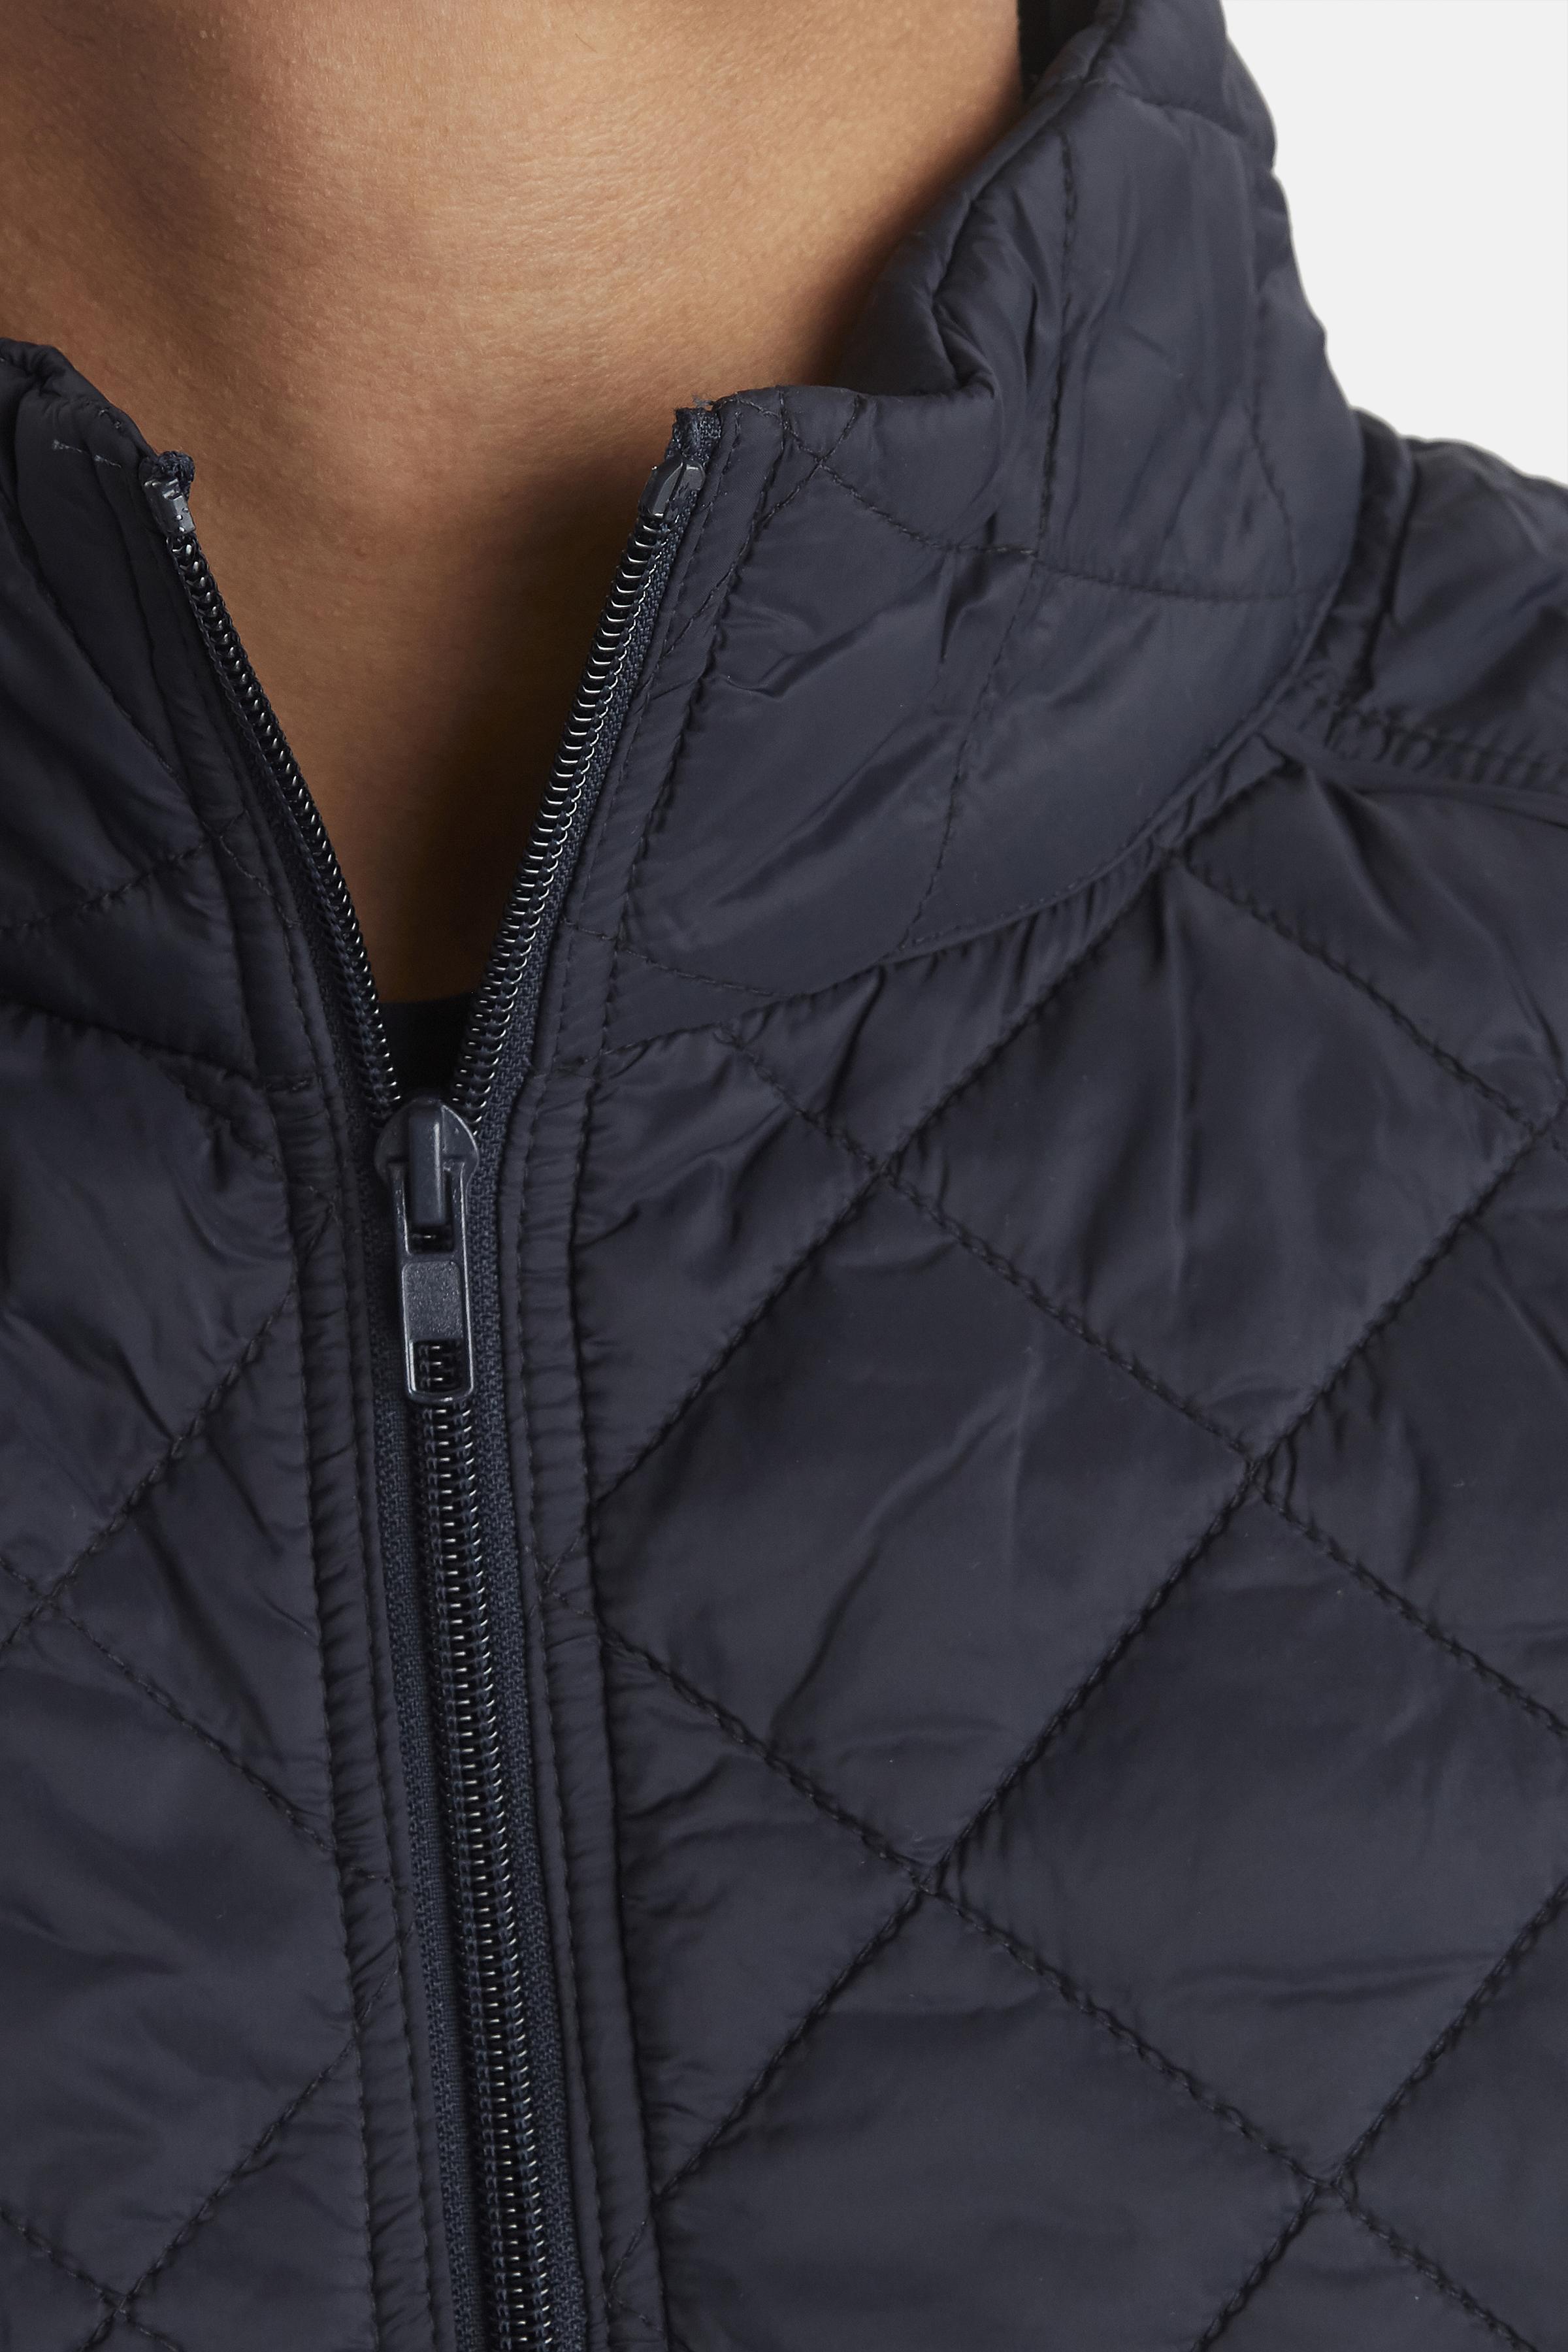 Dark Navy Blue Overtøj – Køb Dark Navy Blue Overtøj fra str. M-XXL her